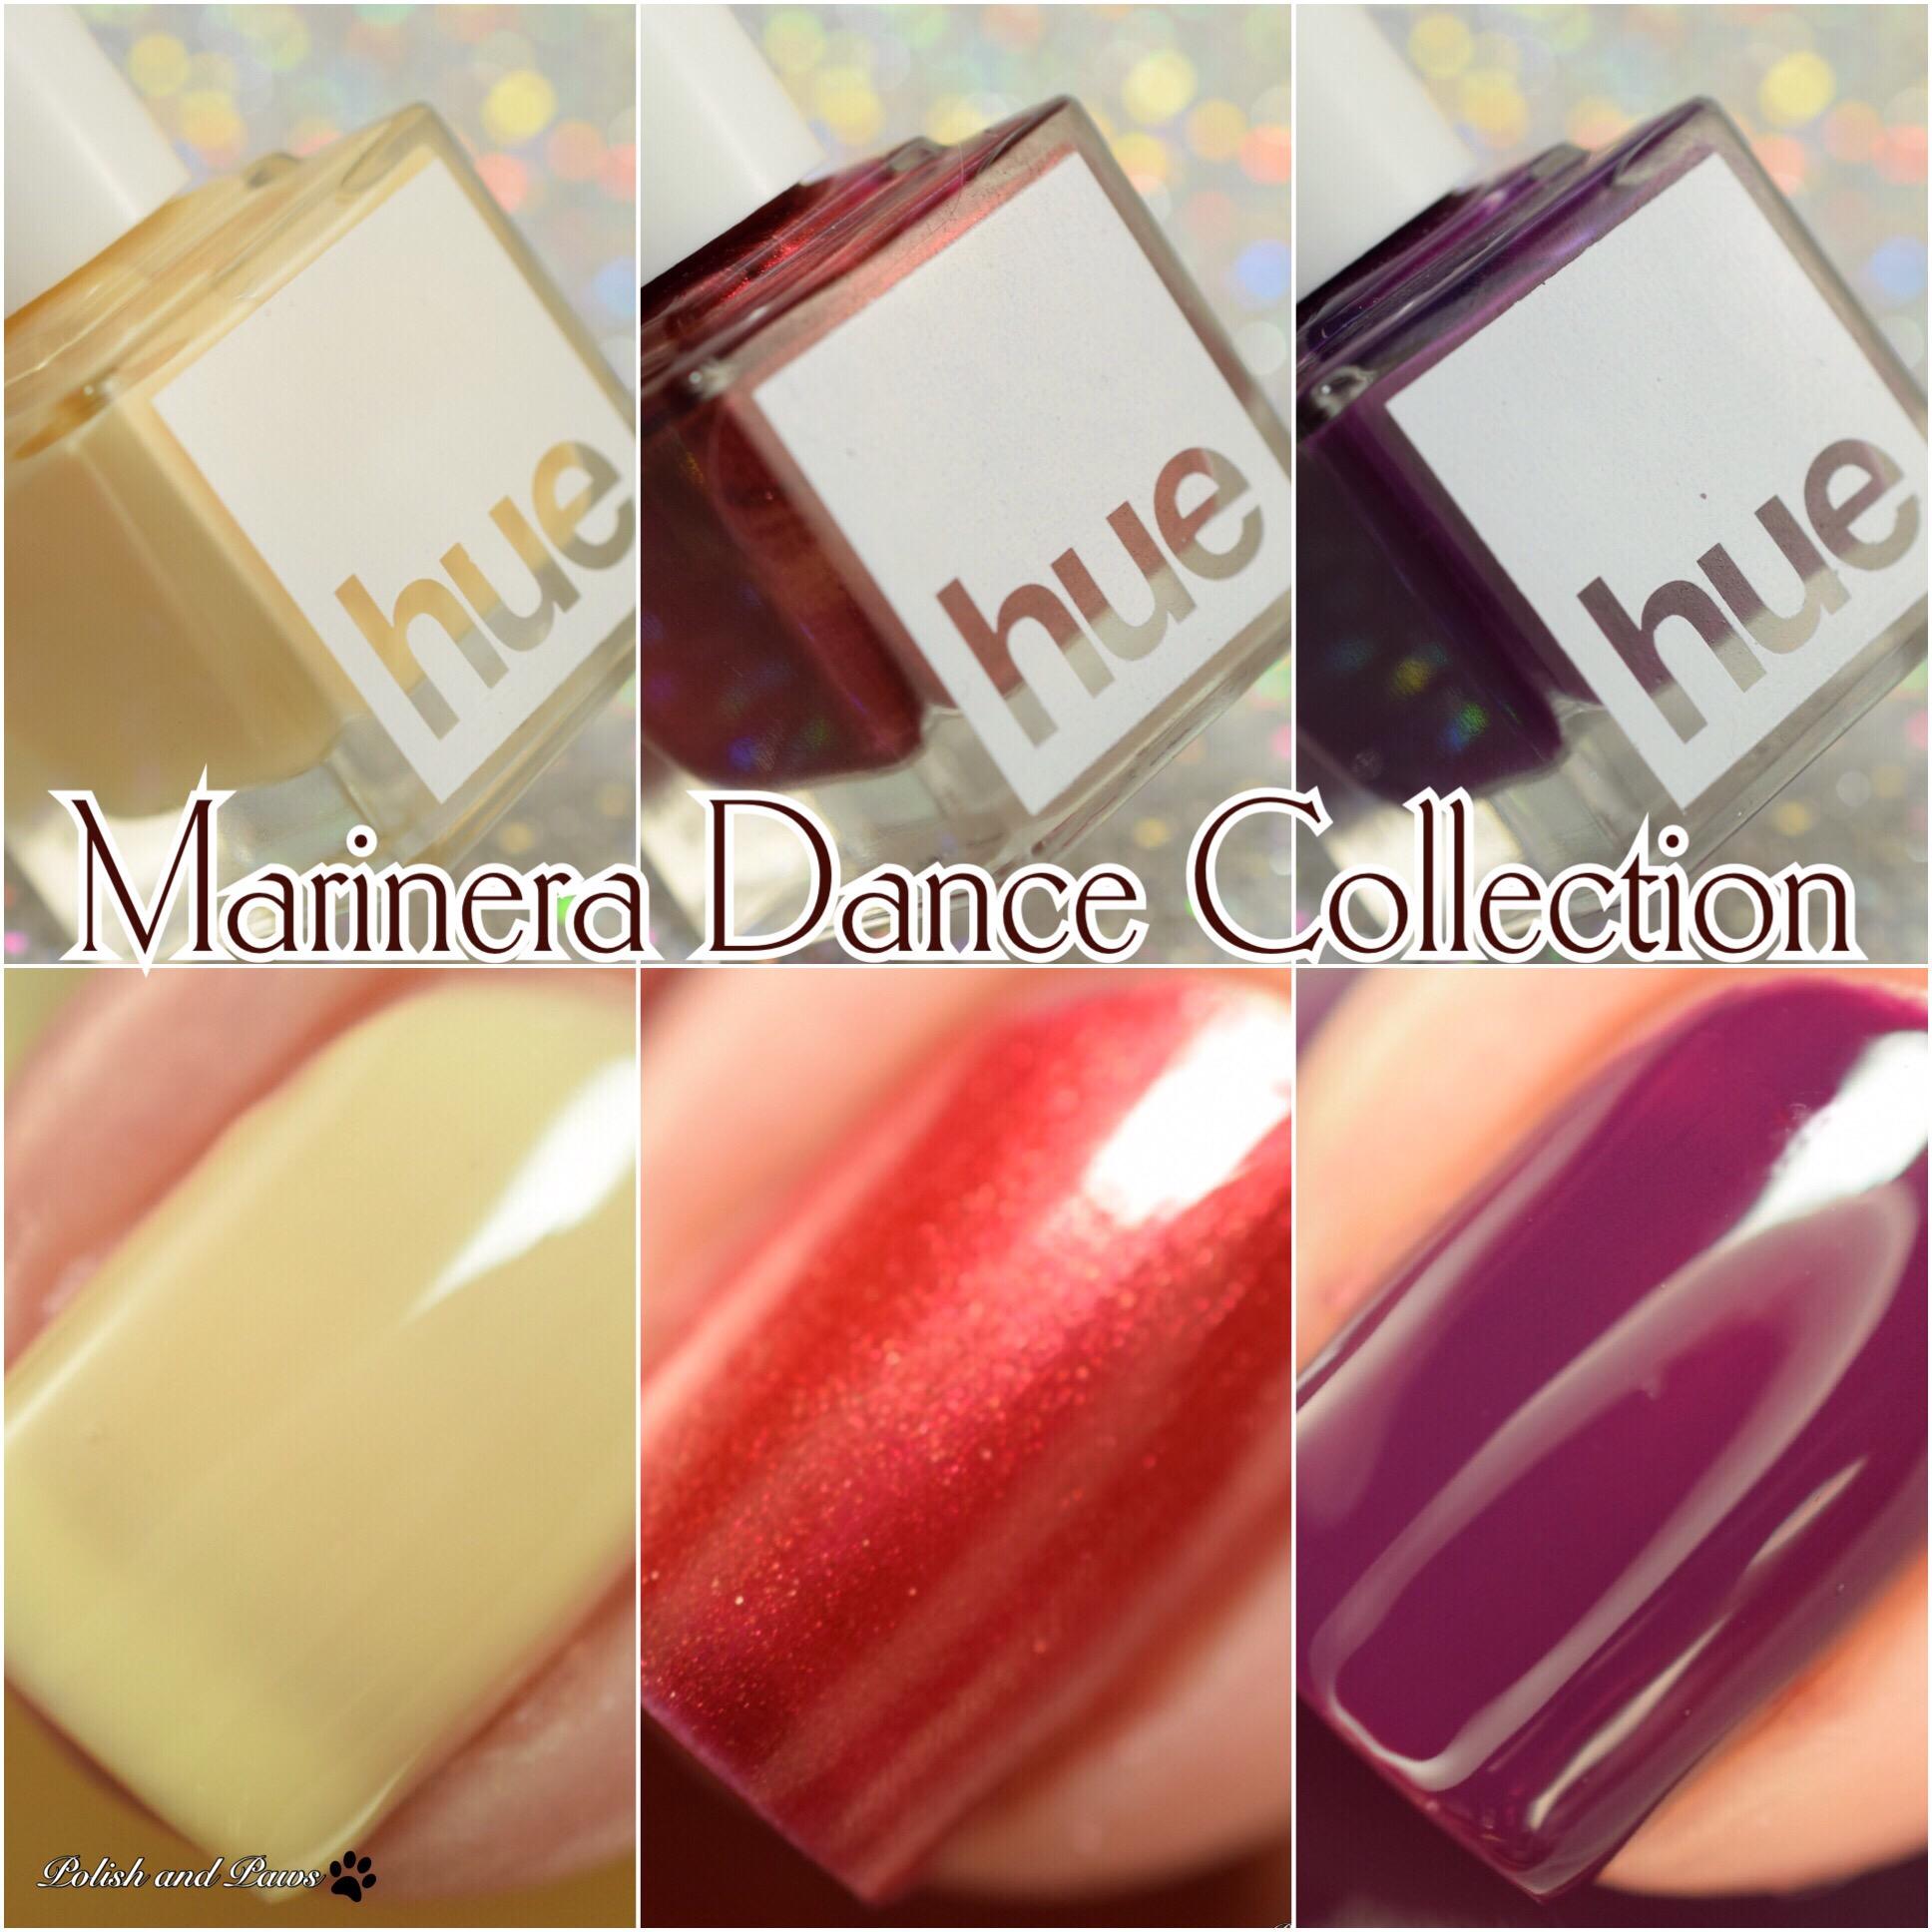 Square Hue Marinera Dance Collection July 2017 Box